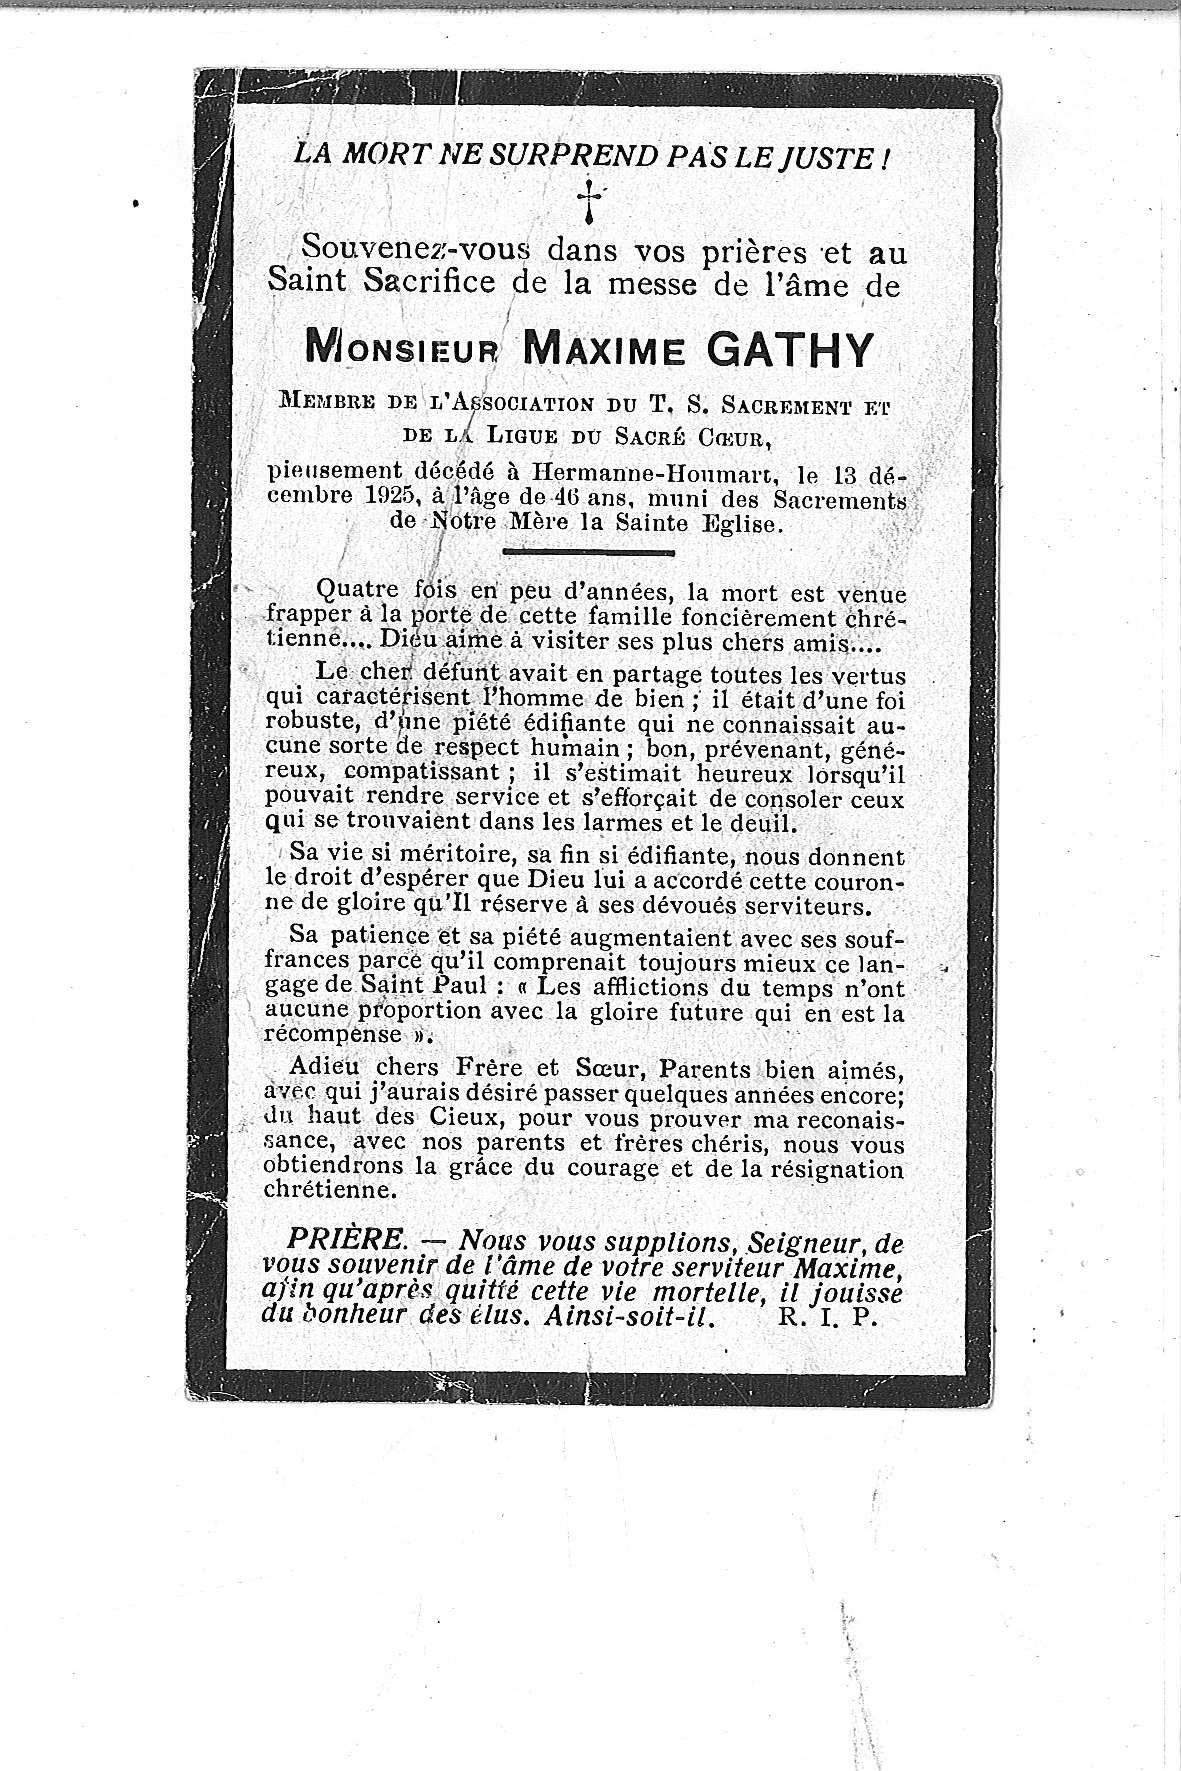 Maxime(1925)20130507145631_00020.jpg